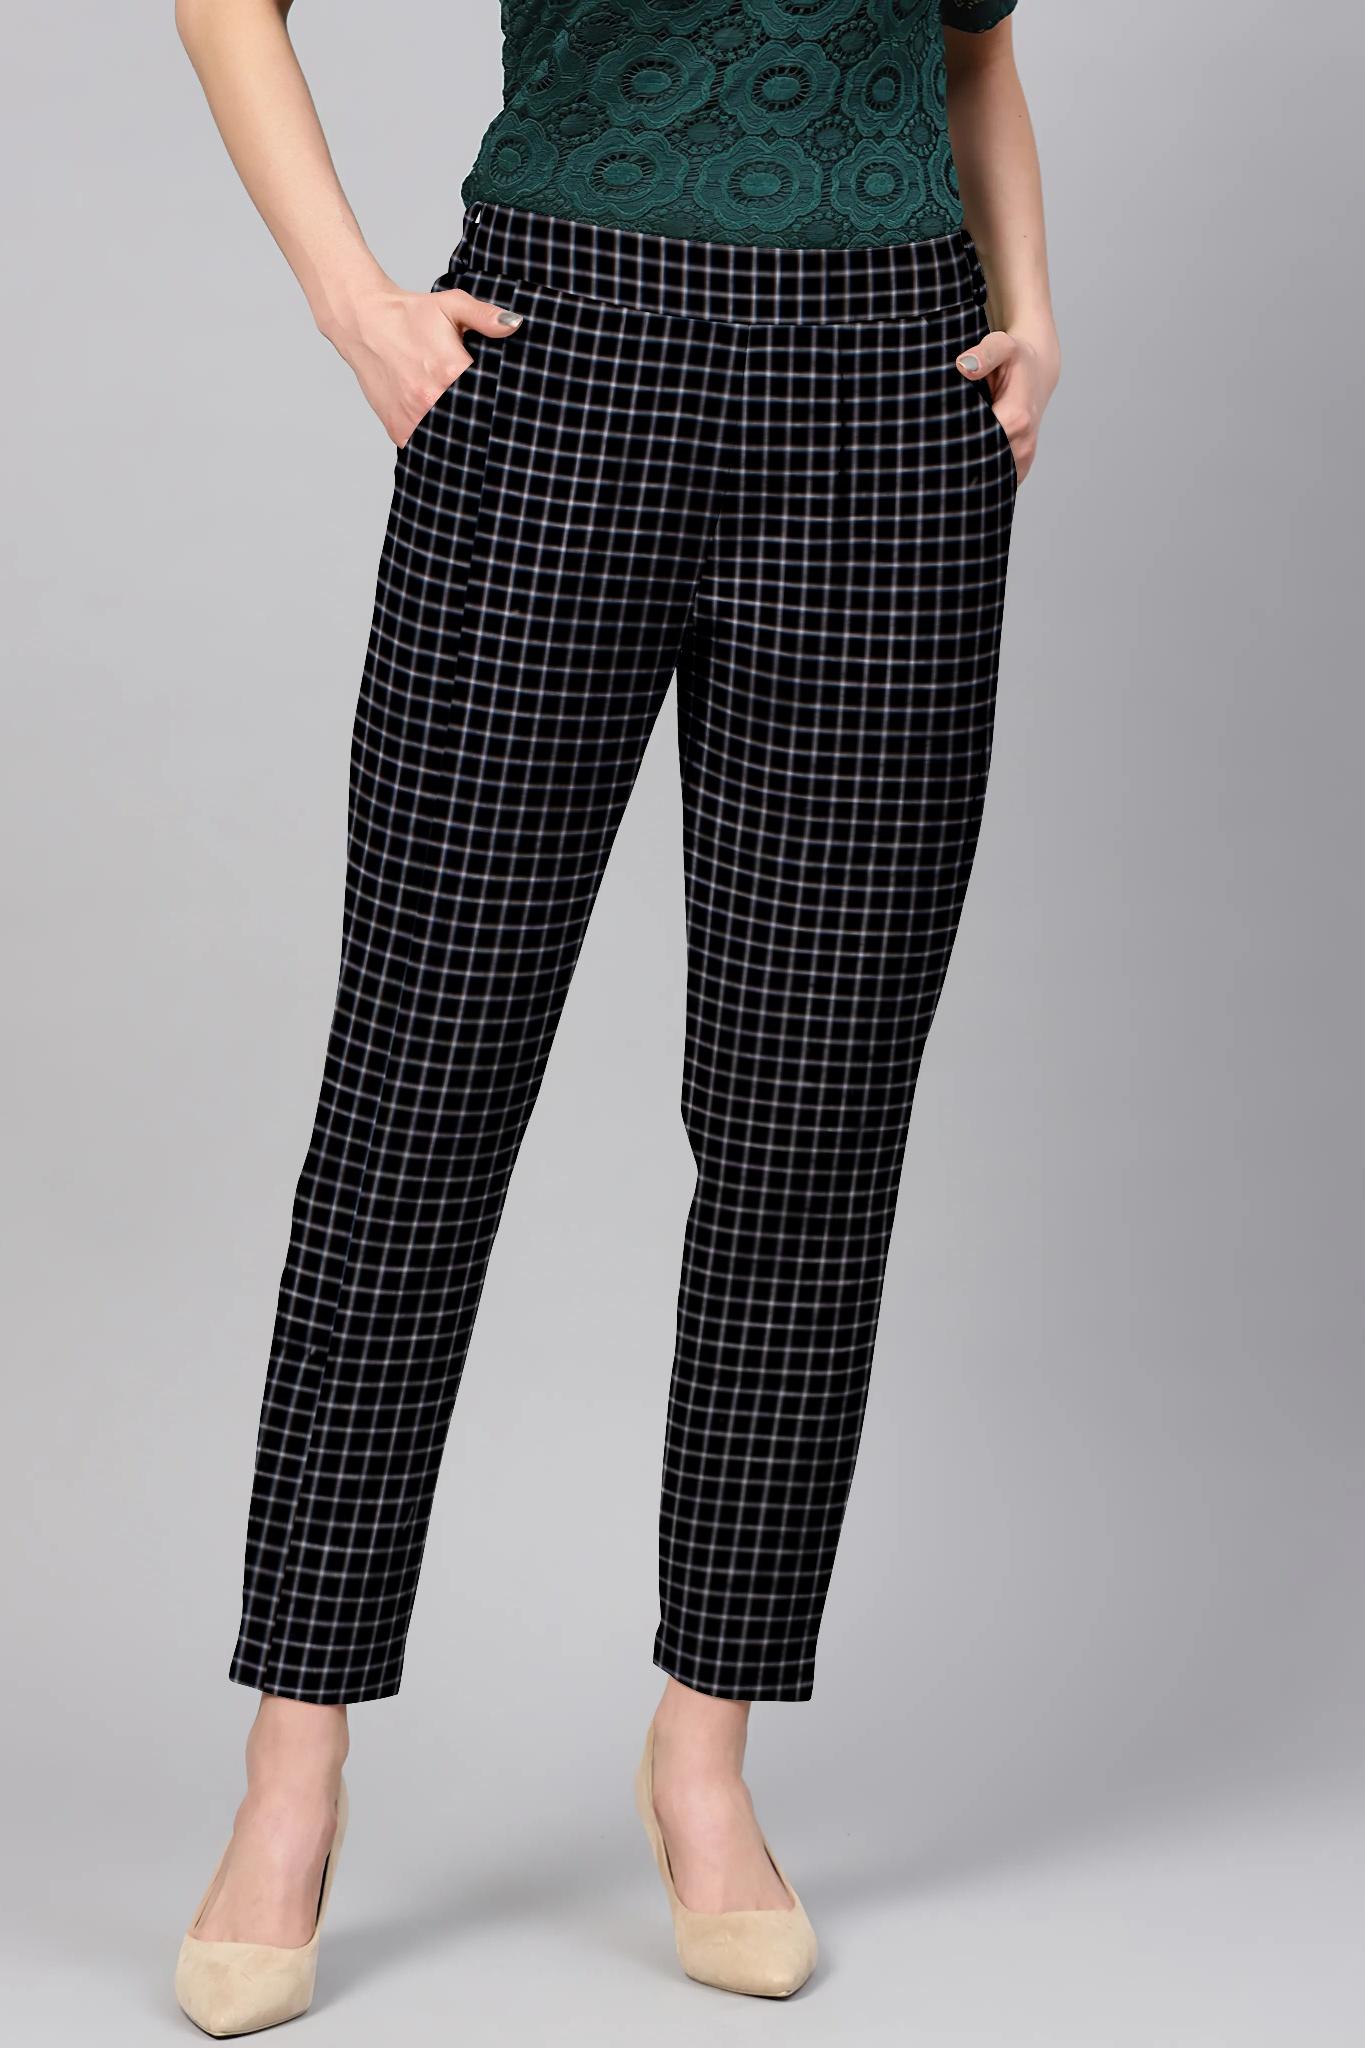 /home/customer/www/fabartcraft.com/public_html/uploadshttps://www.shopolics.com/uploads/images/medium/Black-White-Cotton-Check-Regular-Fit-Solid-Trouser-36110.jpg